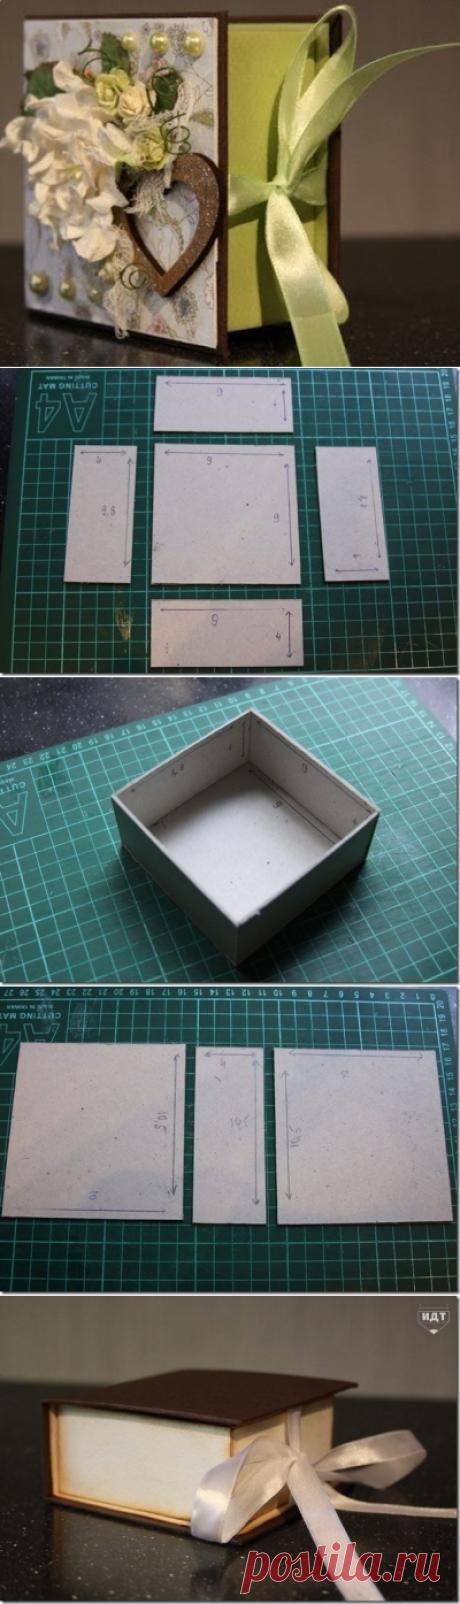 Делаем подарочную коробку...